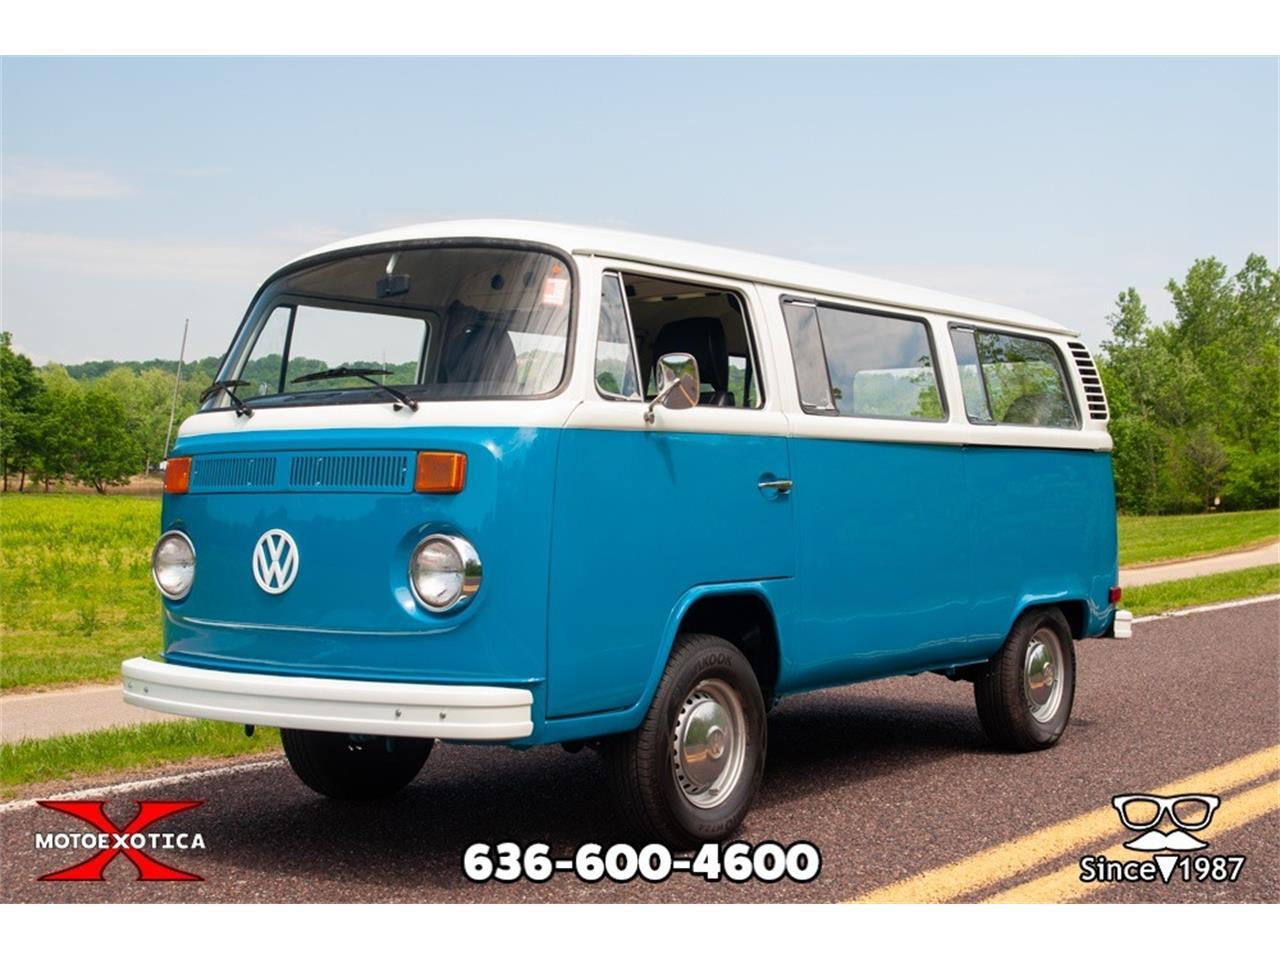 1977 Volkswagen Bus For Sale Classiccars Com Cc 1095529